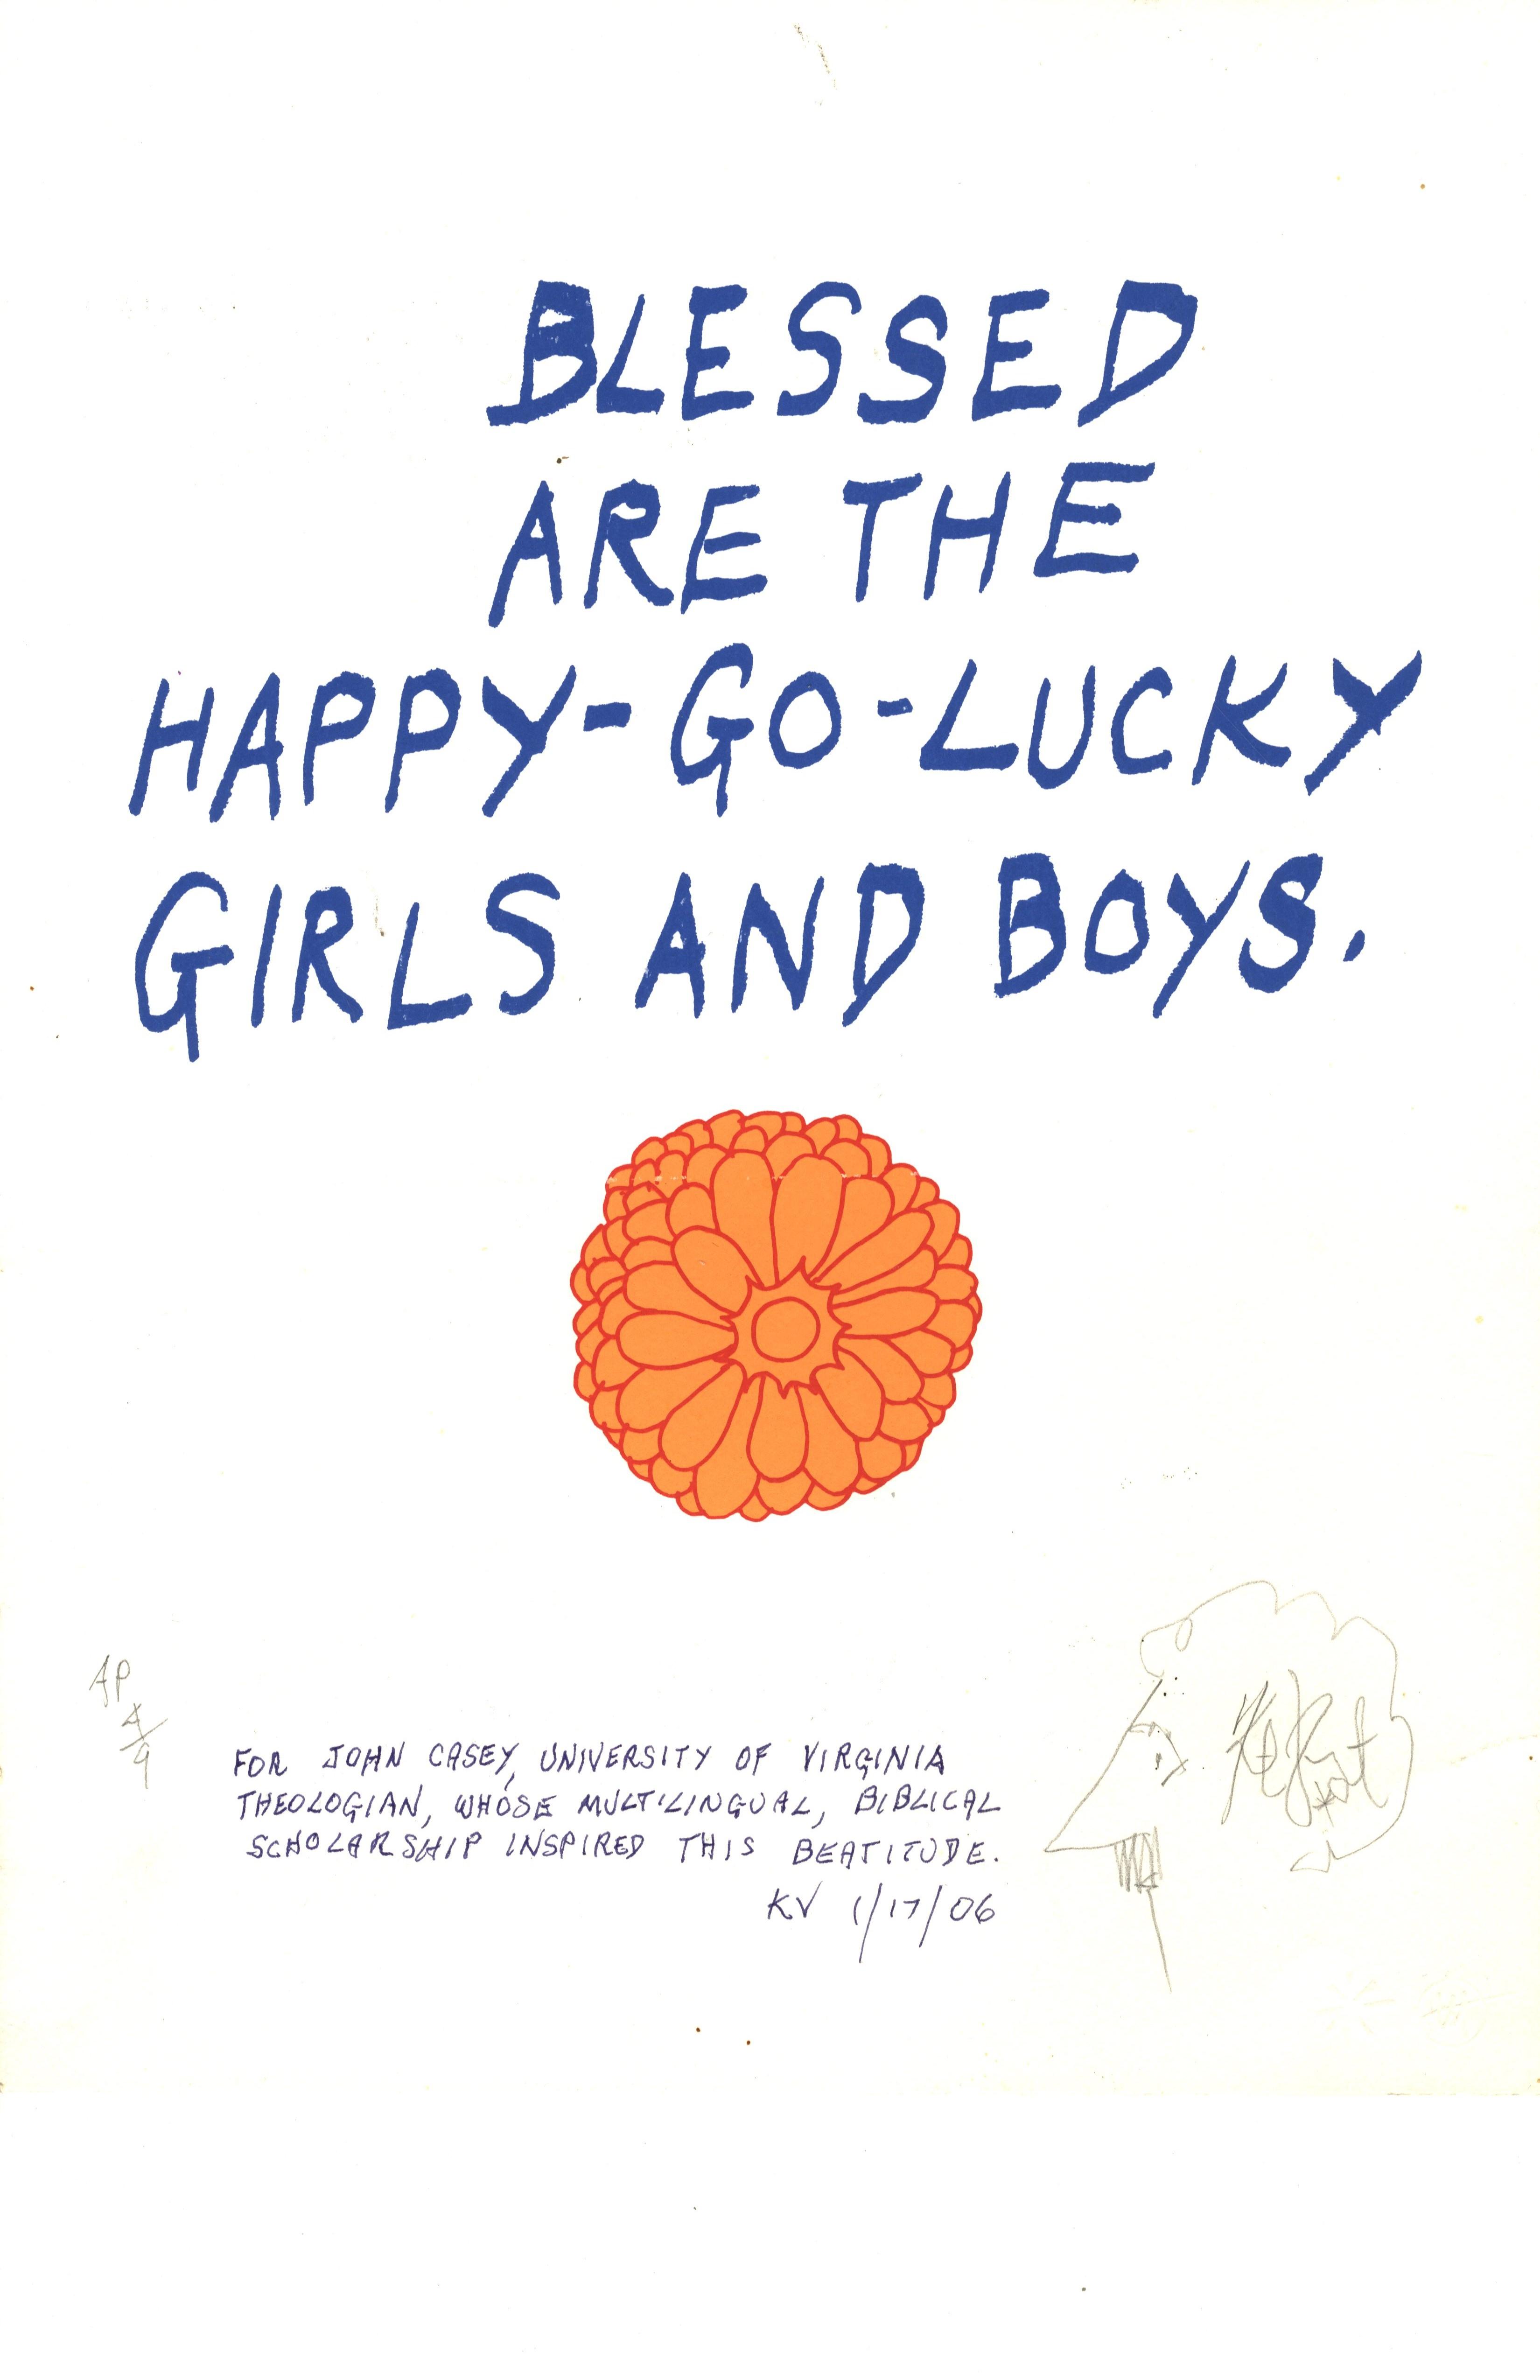 Happy Go Lucky Quotes Life: Kurt Vonnegut Reads The Bible